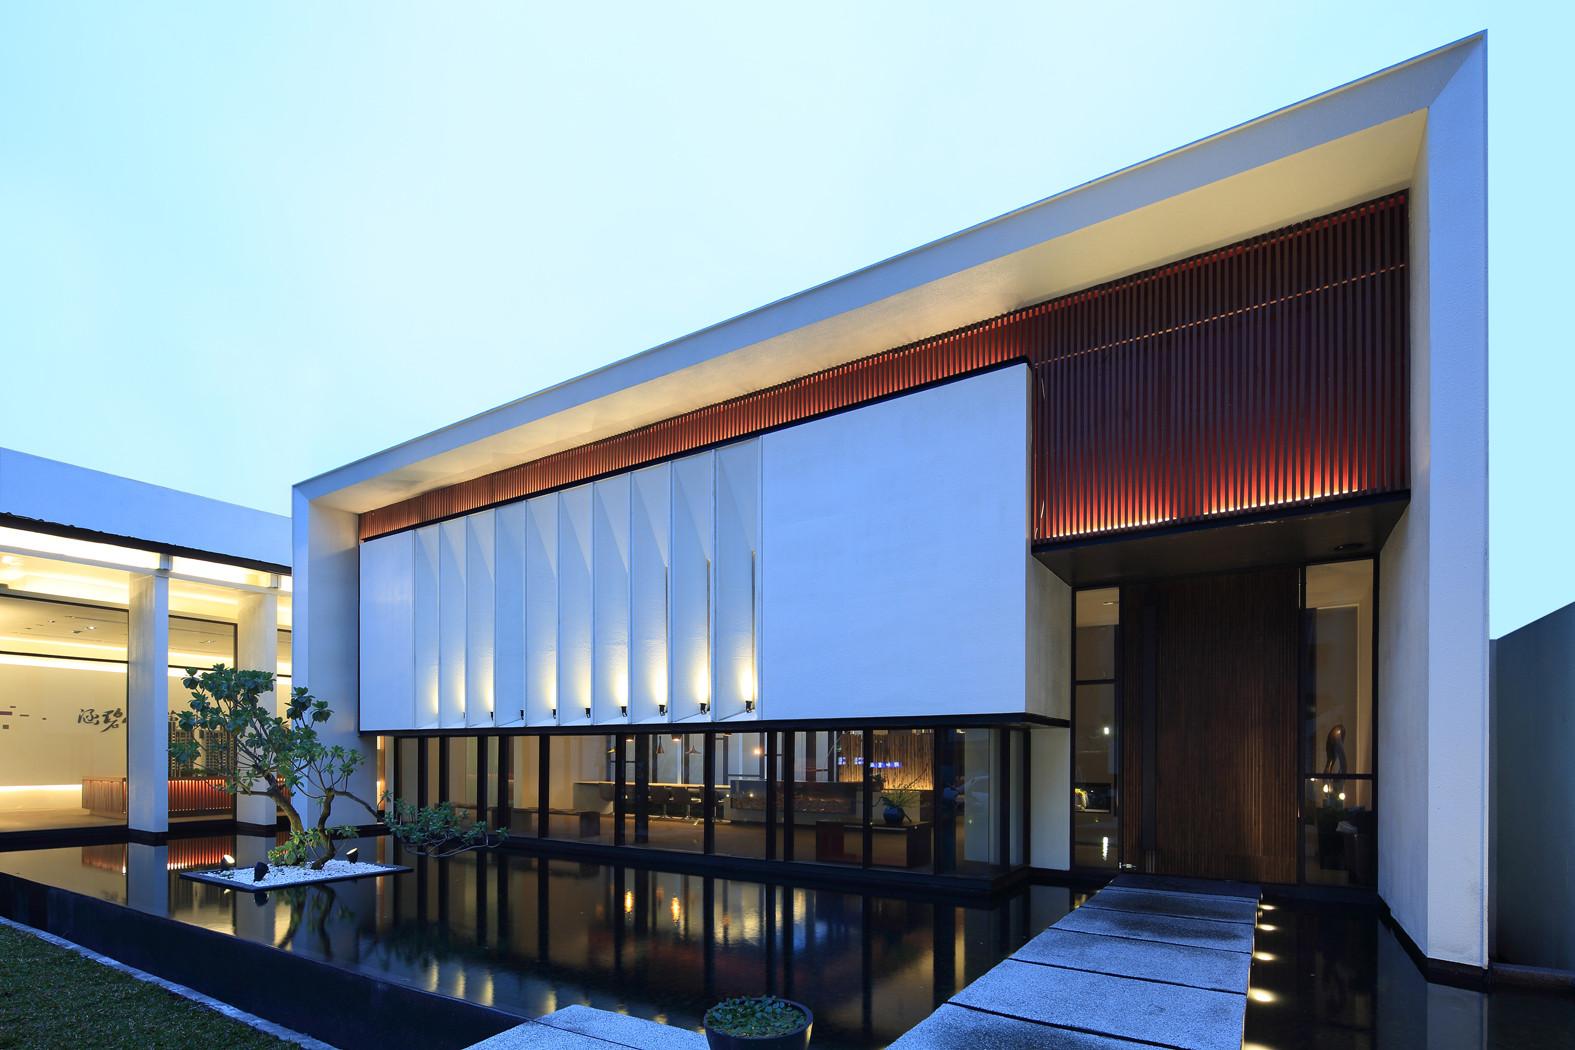 Gallery of exquisite minimalist arcadian architecture for Minimalist architecture design house